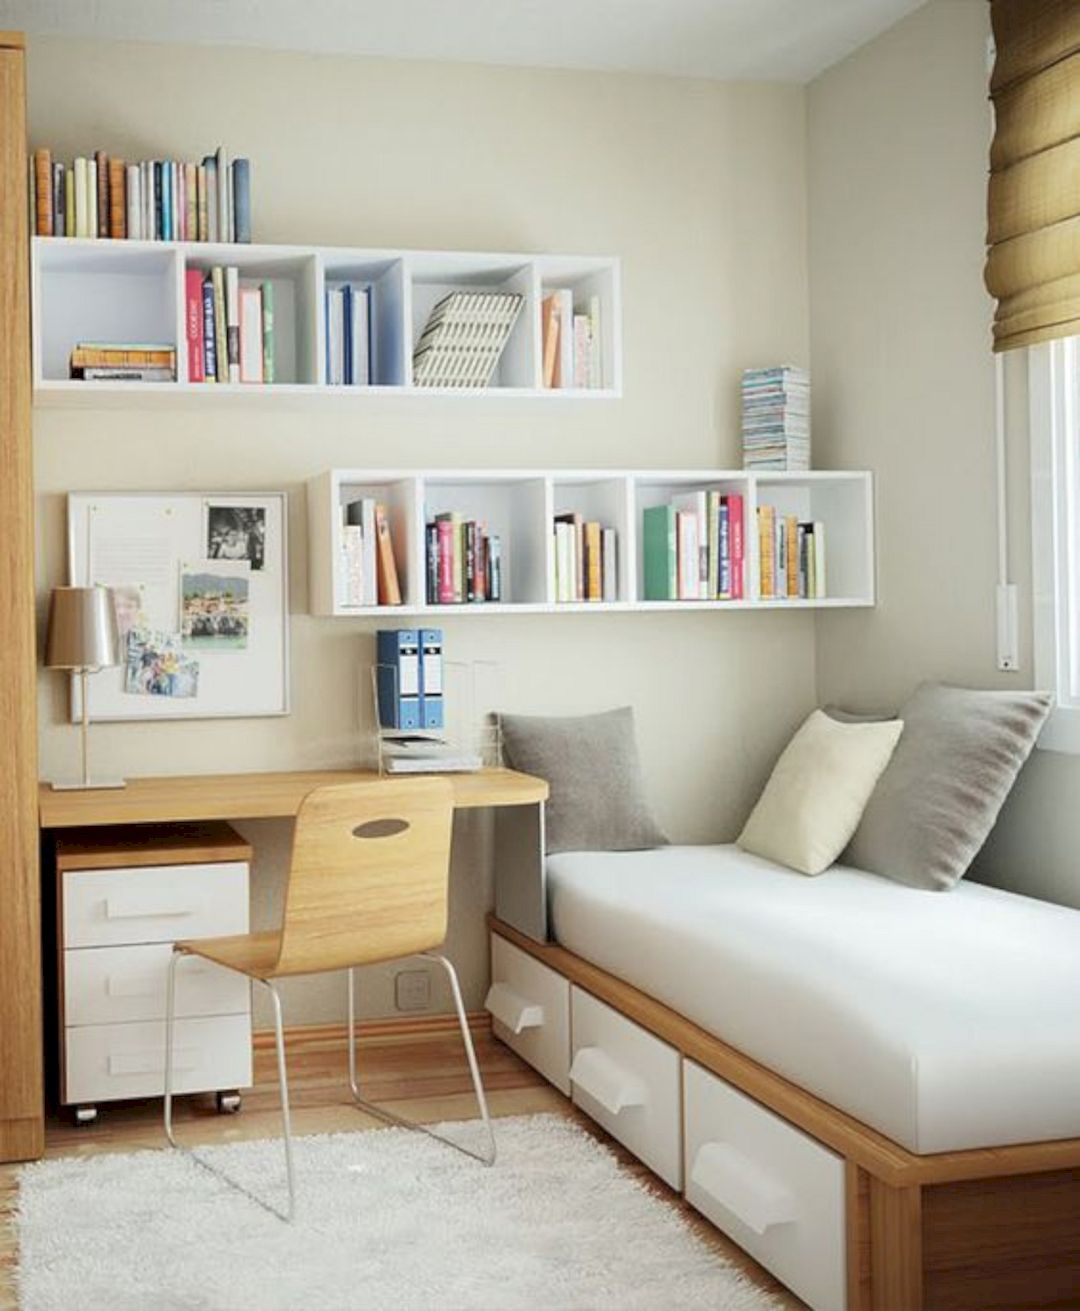 Small Of Dorm Room Furniture Ideas